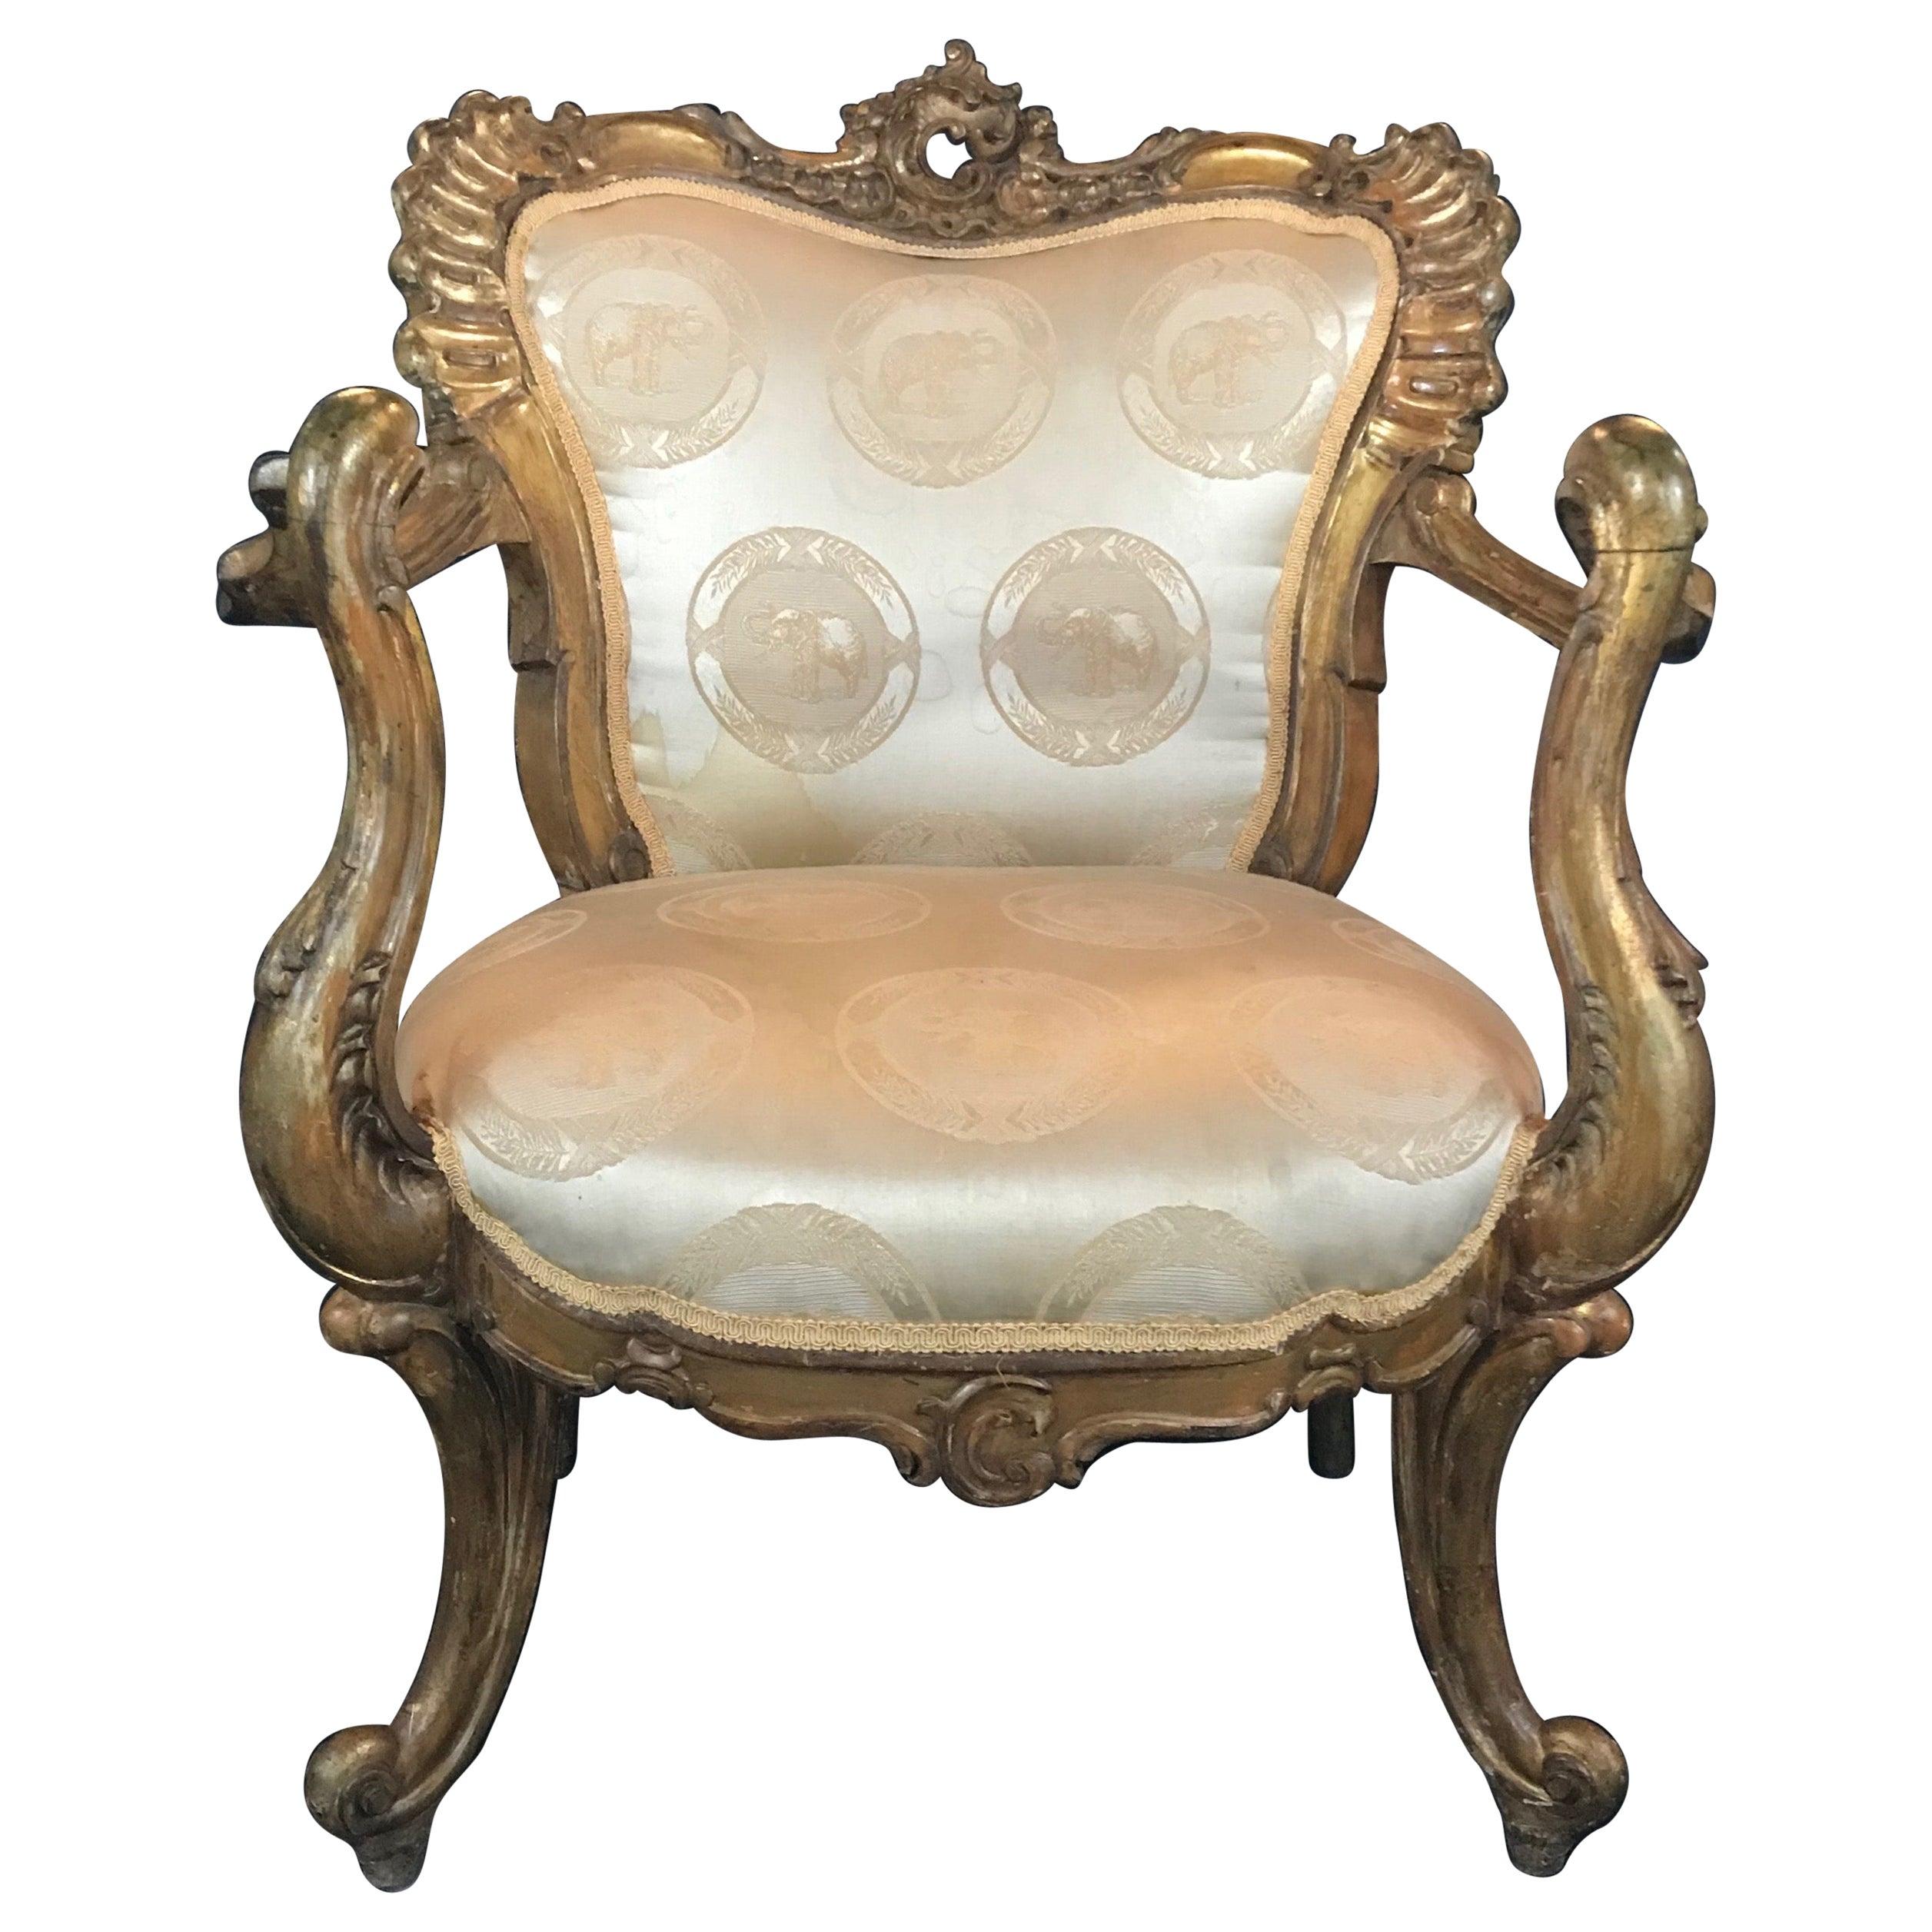 Very Glamorous Italian Neoclassical Venetian Style Carved Chair Bergère